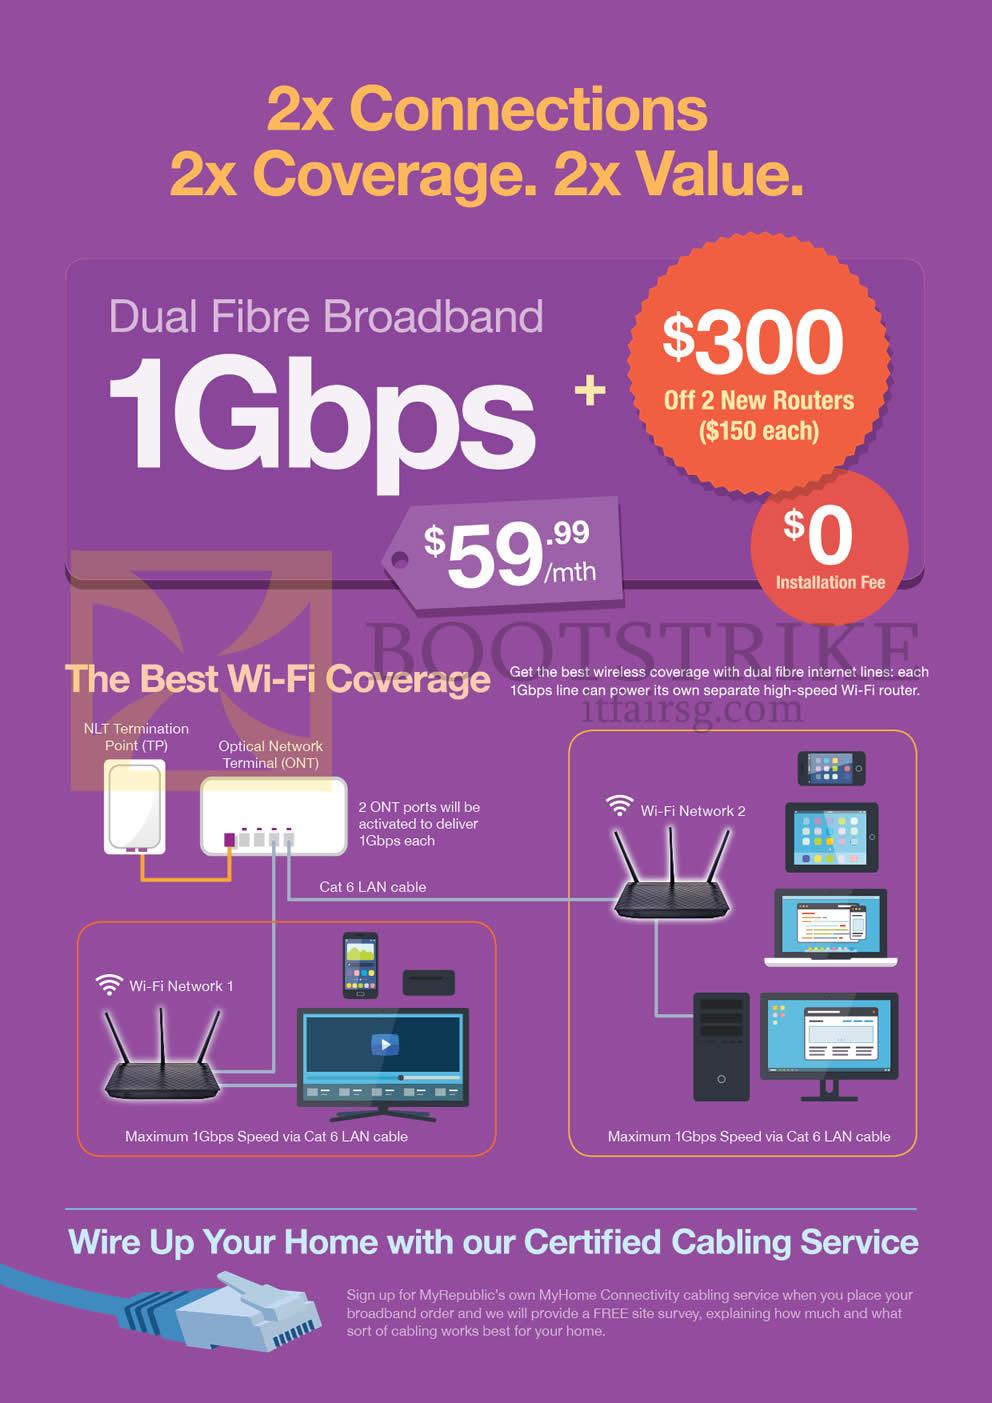 SITEX 2015 price list image brochure of MyRepublic 59.99 1Gbps Dual Fibre Broadband